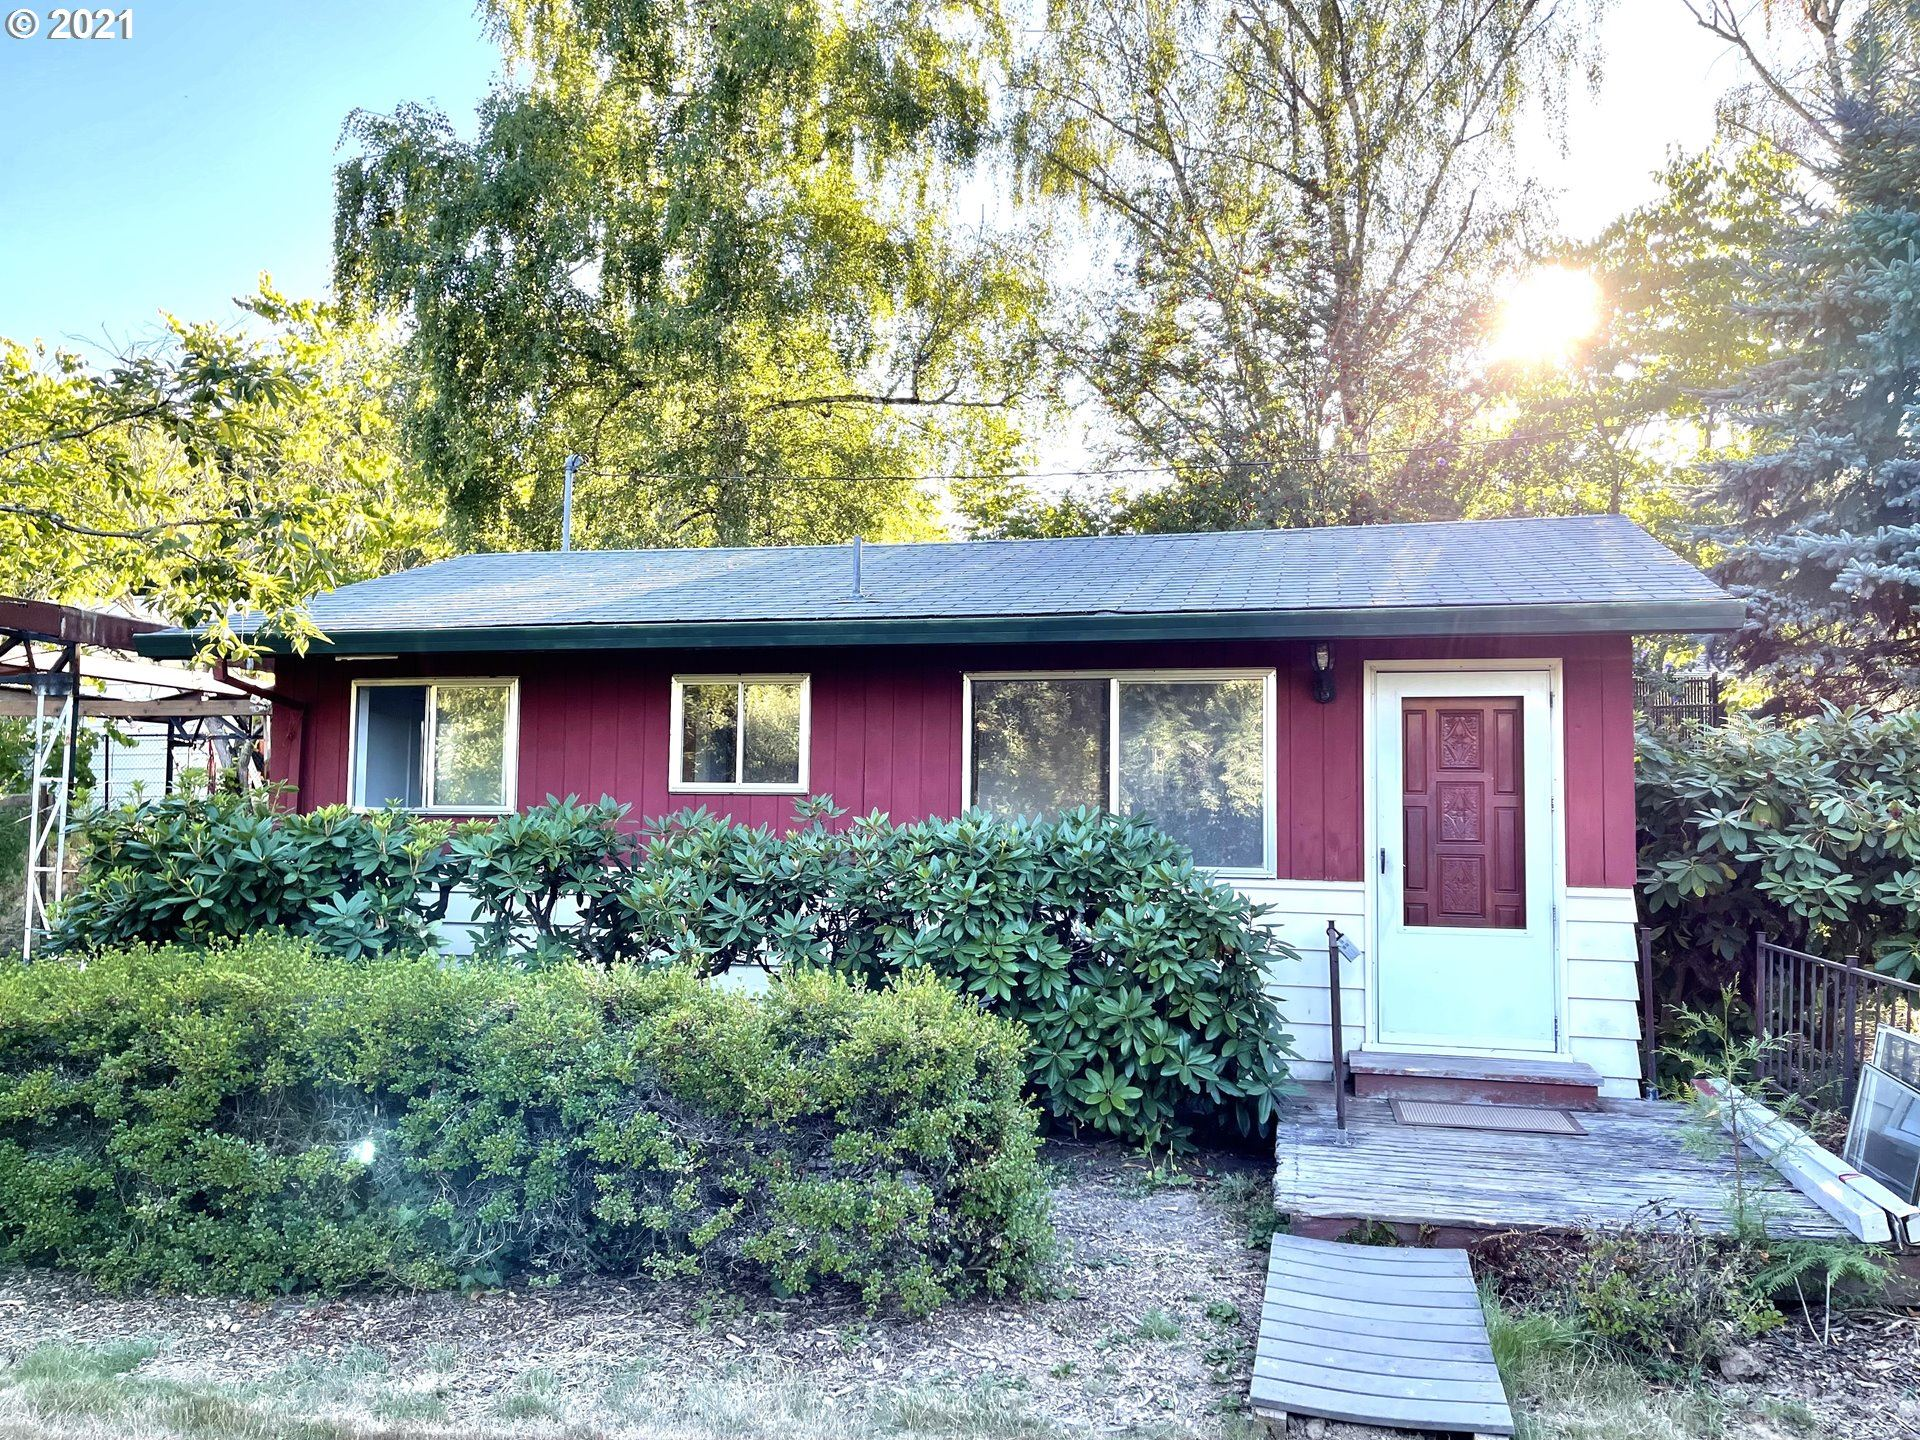 SE KNAPP ST, Portland, OR 97236 - MLS#: 21386204